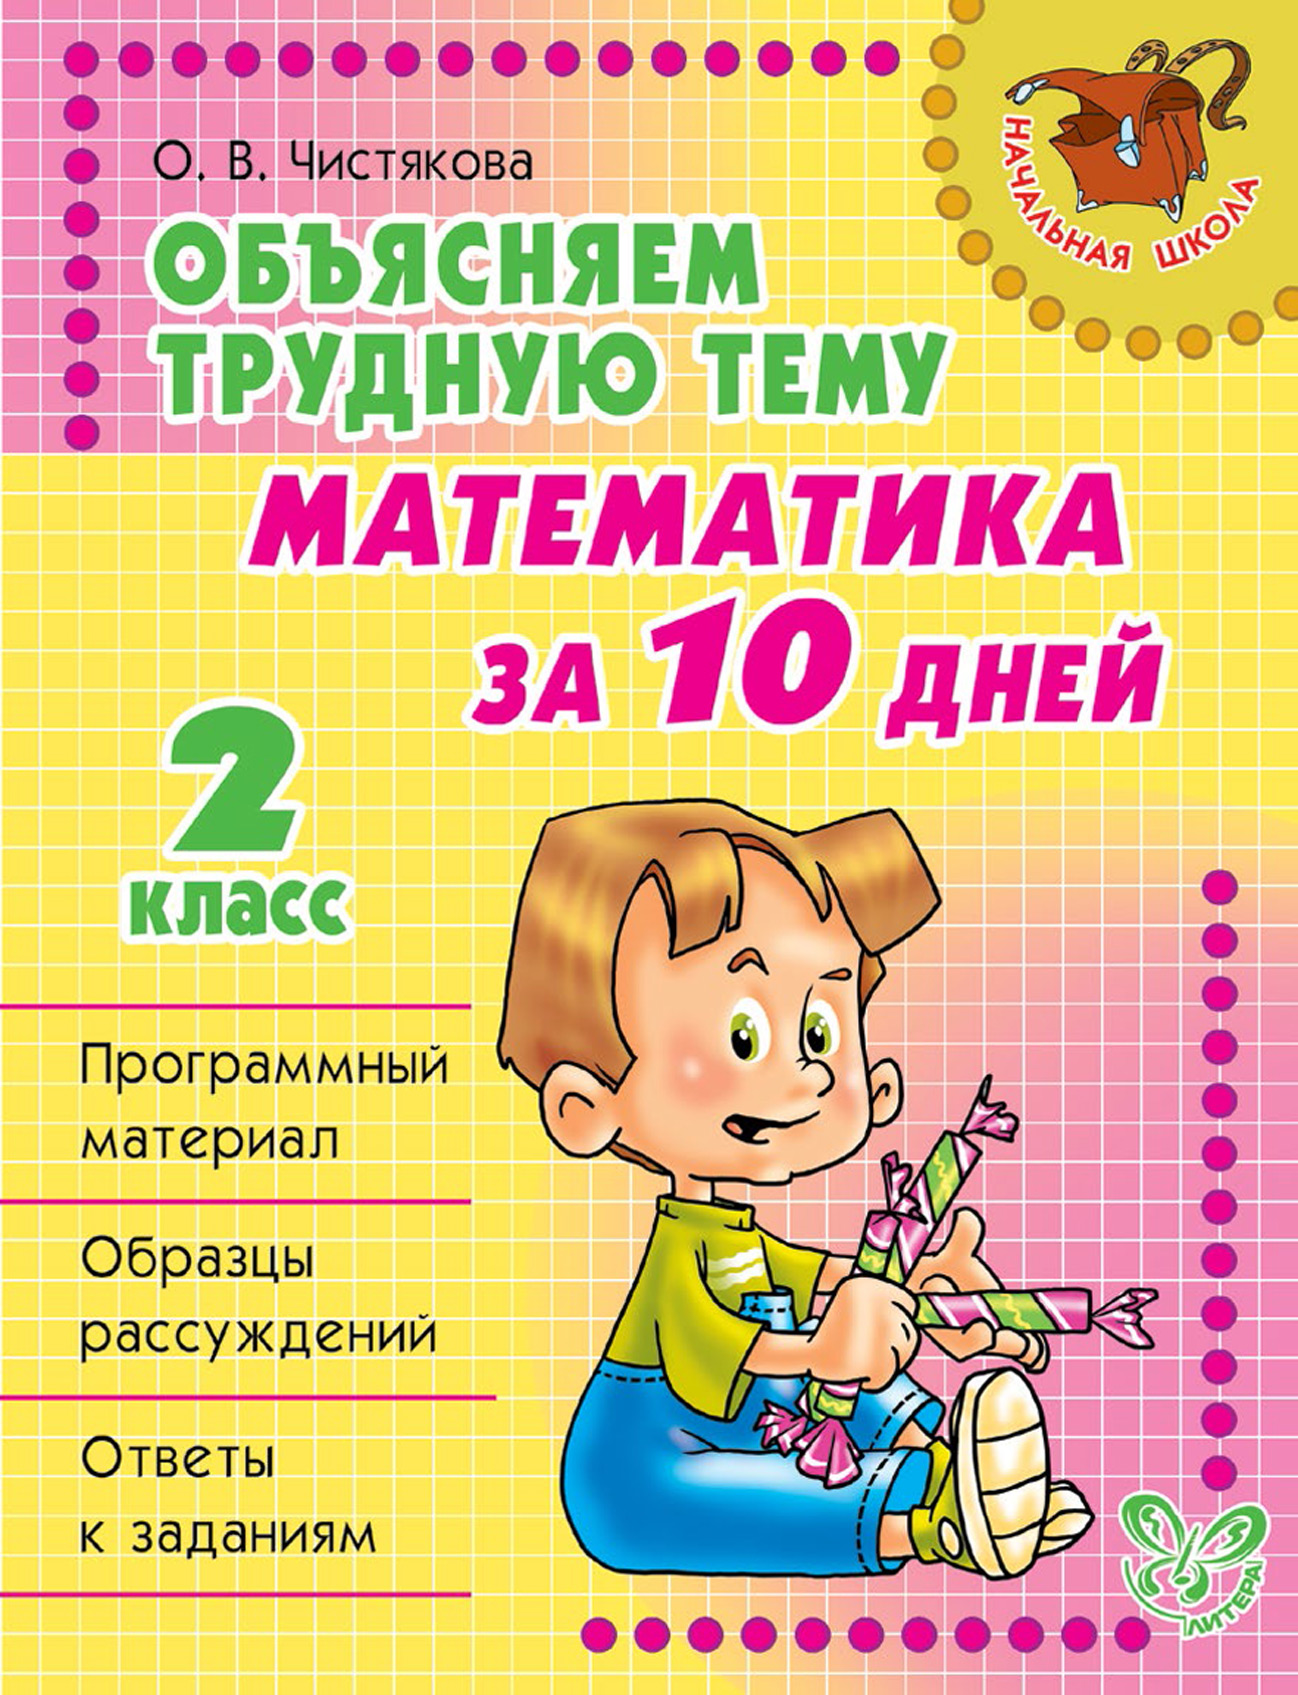 О. В. Чистякова Объясняем трудную тему. Математика за 10 дней. 2 класс о в чистякова математика за 10 дней 3 класс